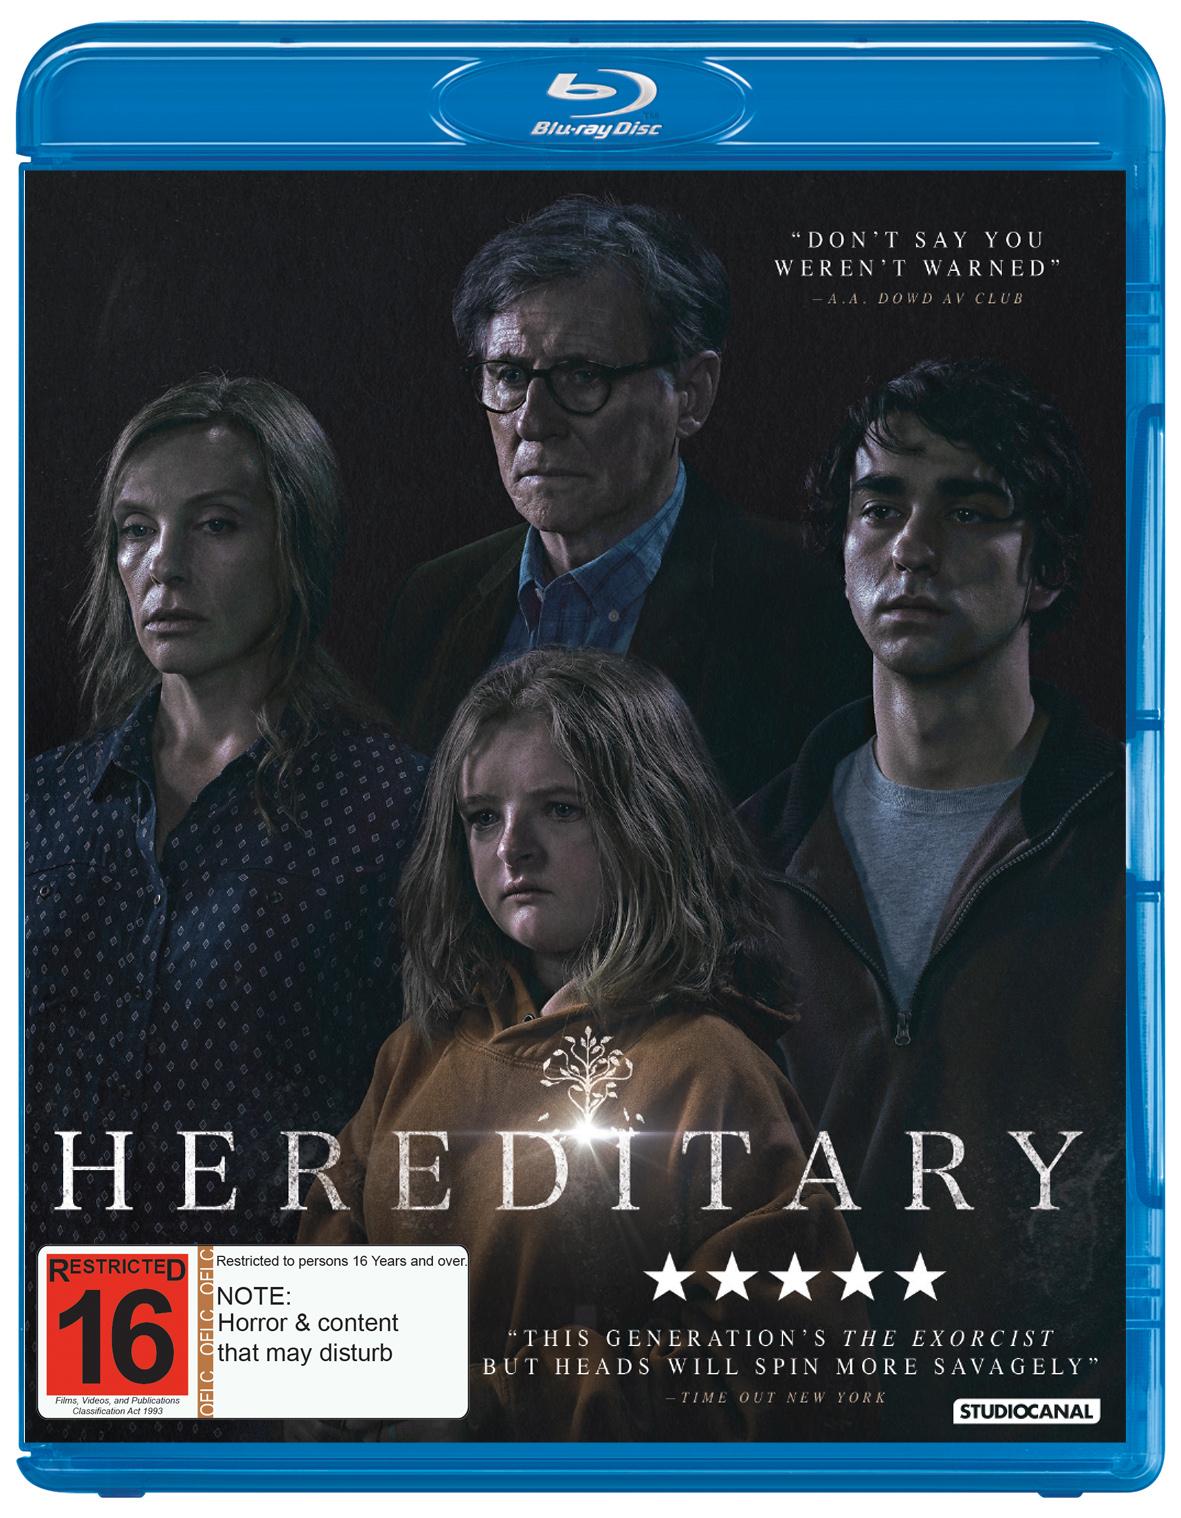 Hereditary on Blu-ray image